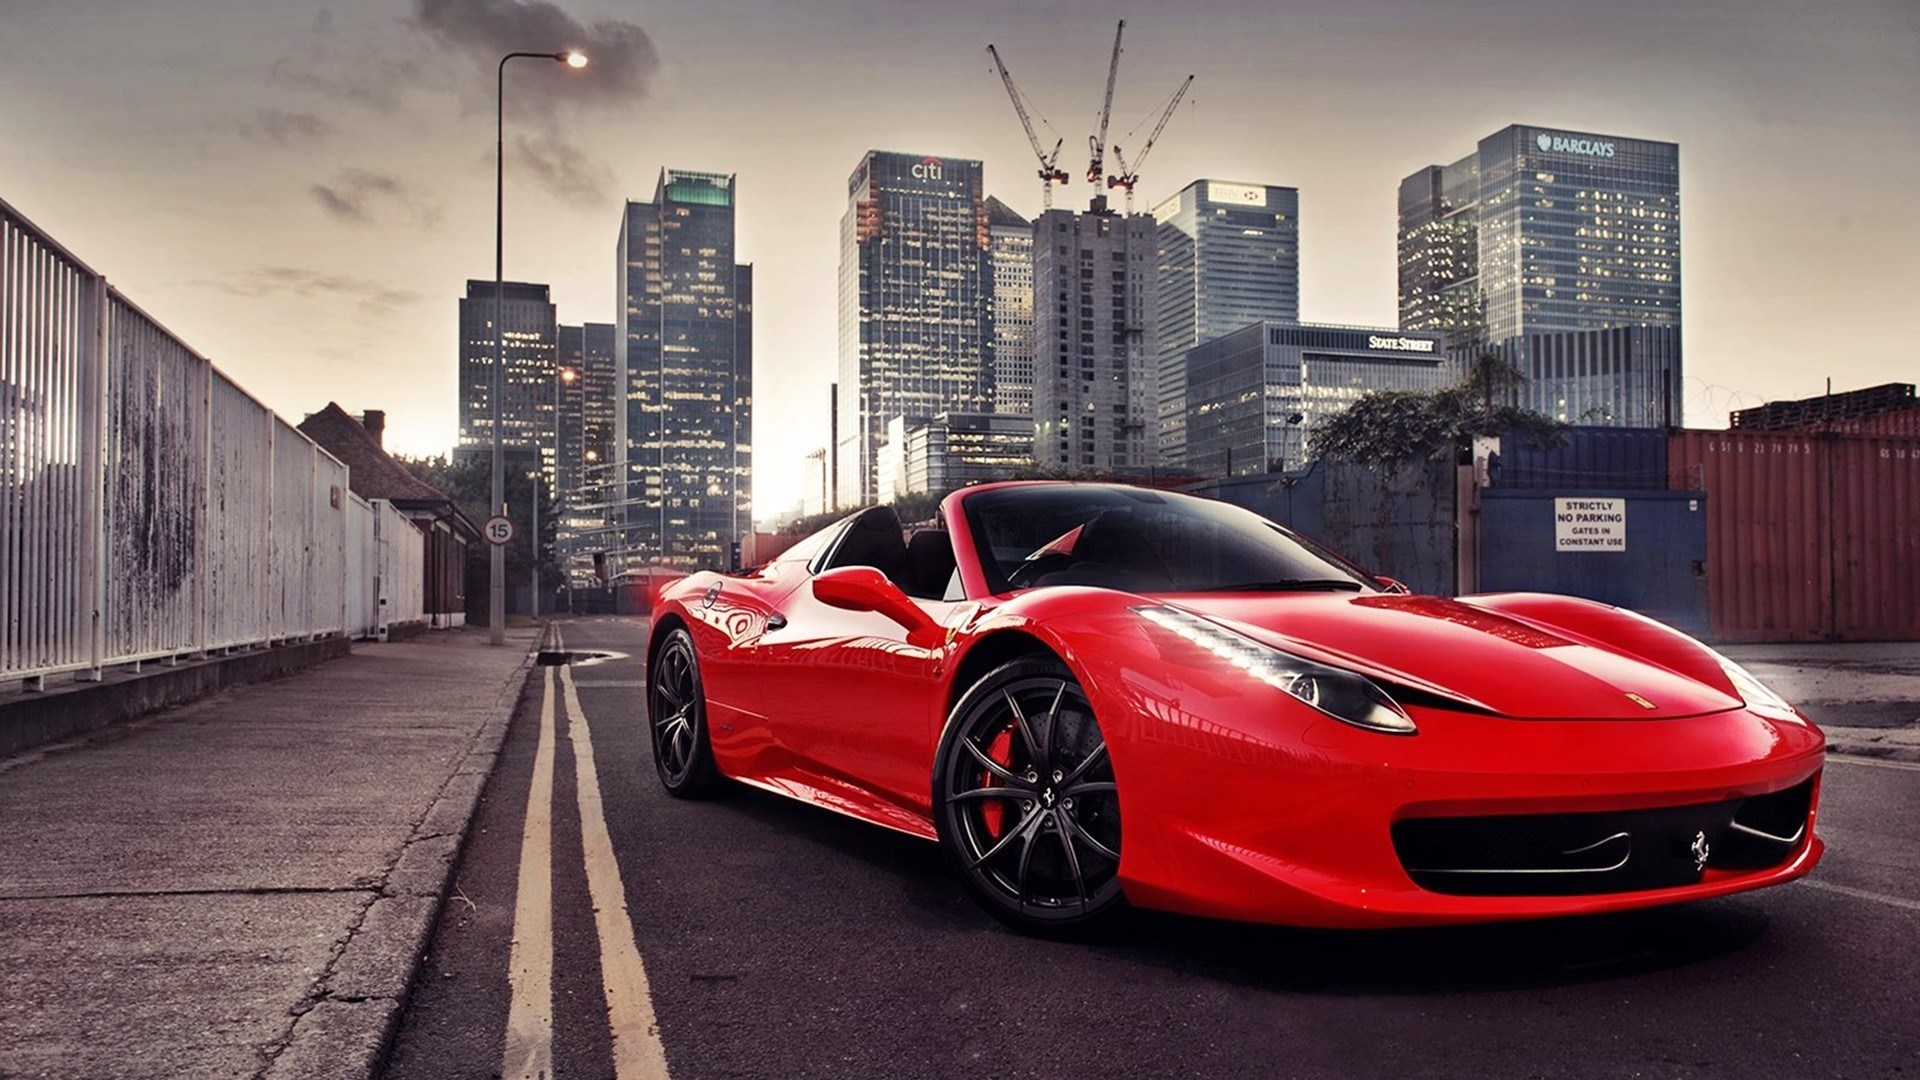 ferrari 458 italia wallpaper hd red Vehicle Pictures 1920x1080